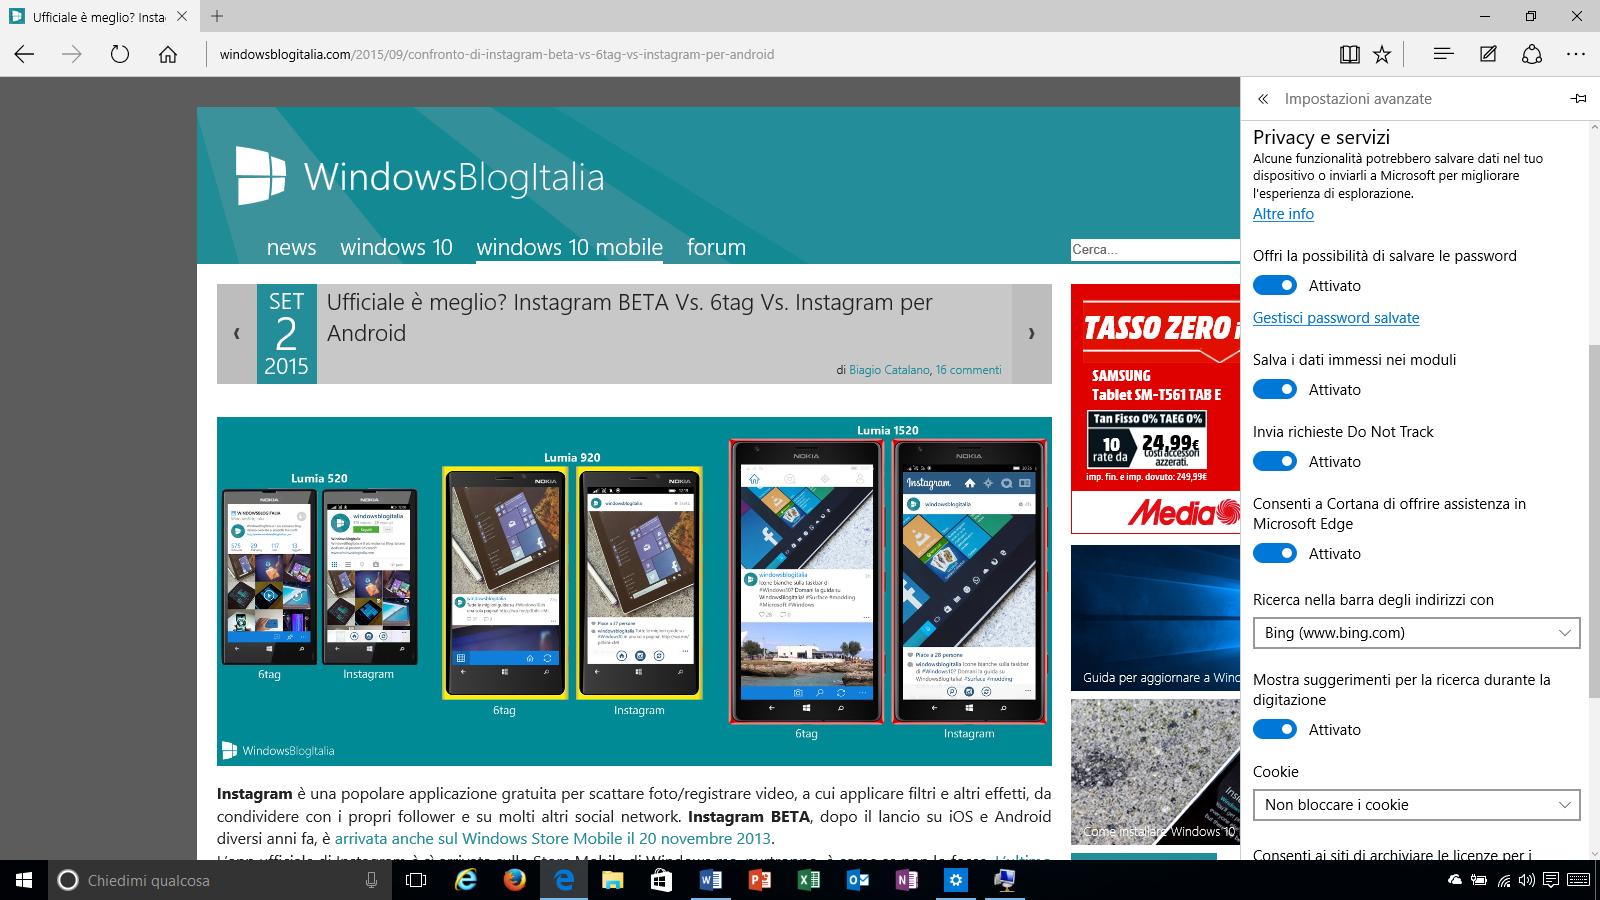 MicrosoftEdge-12